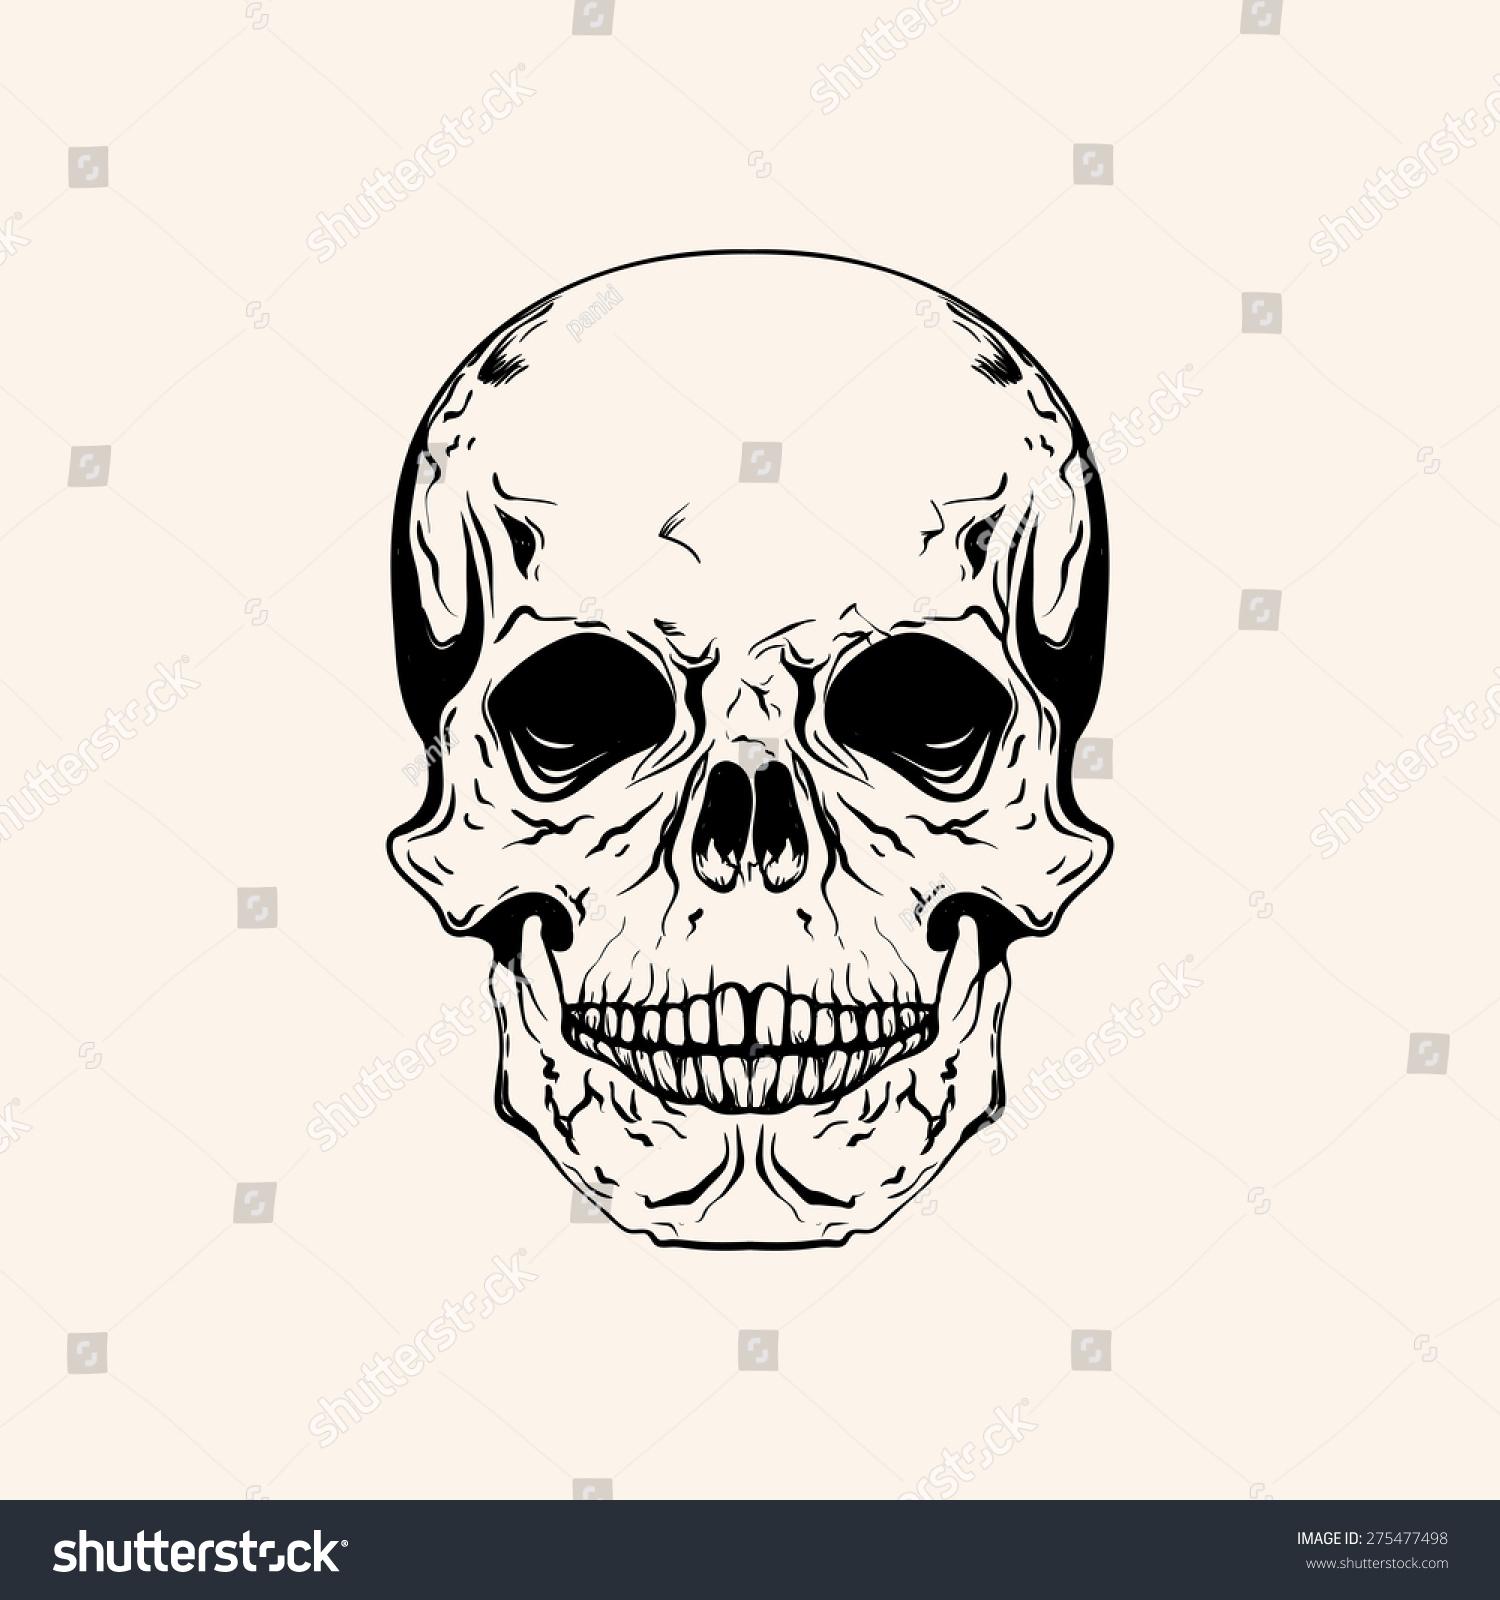 Skull Line Drawing Tattoo : Hand drawn sketch skull tattoo line stock vector